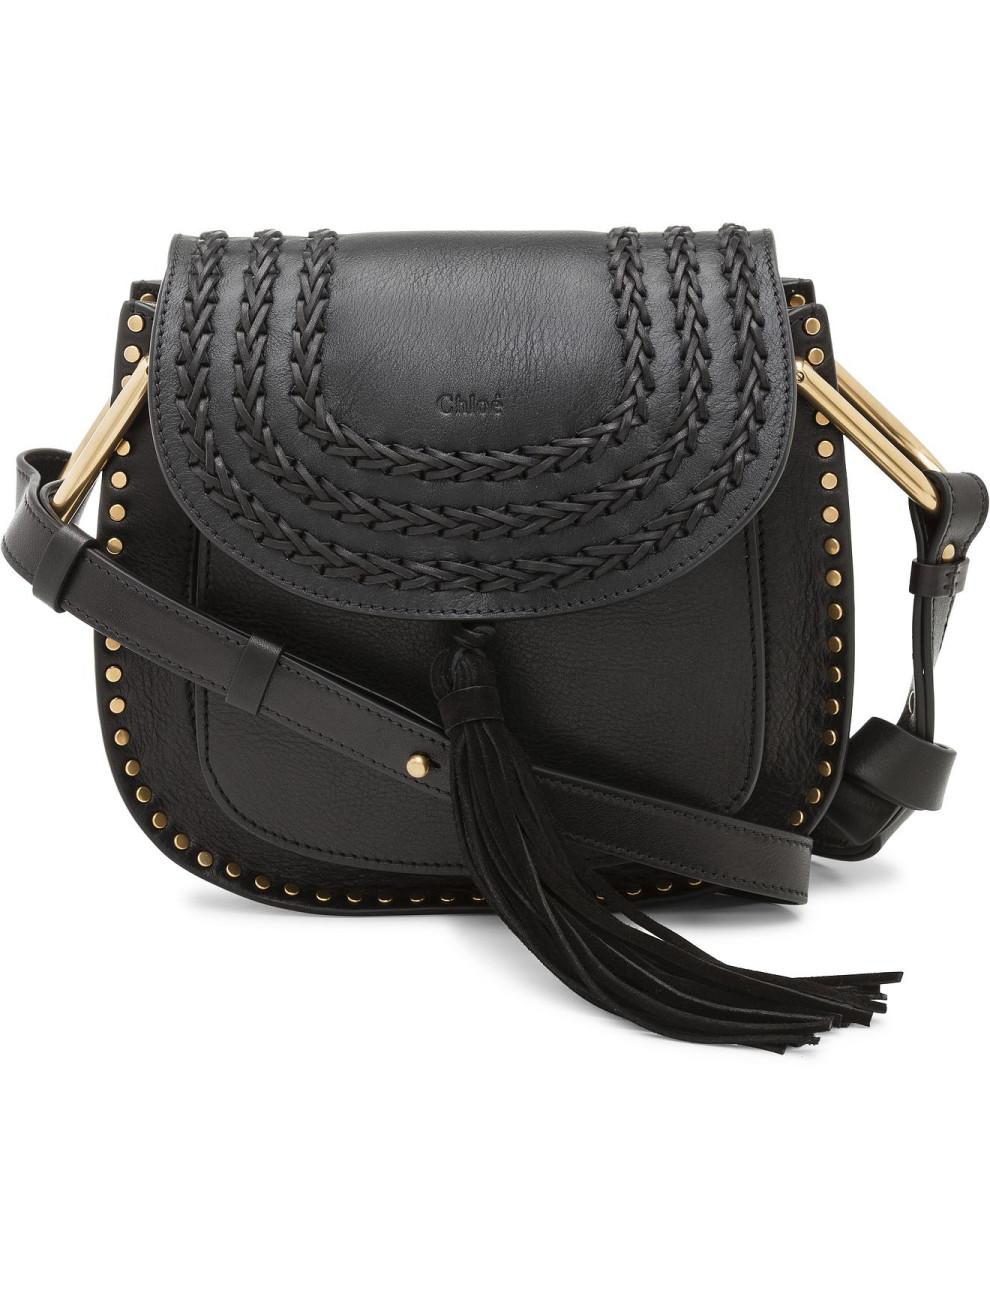 chole bag - Chlo�� | Bags \u0026amp; Accessories | International Designers | David Jones